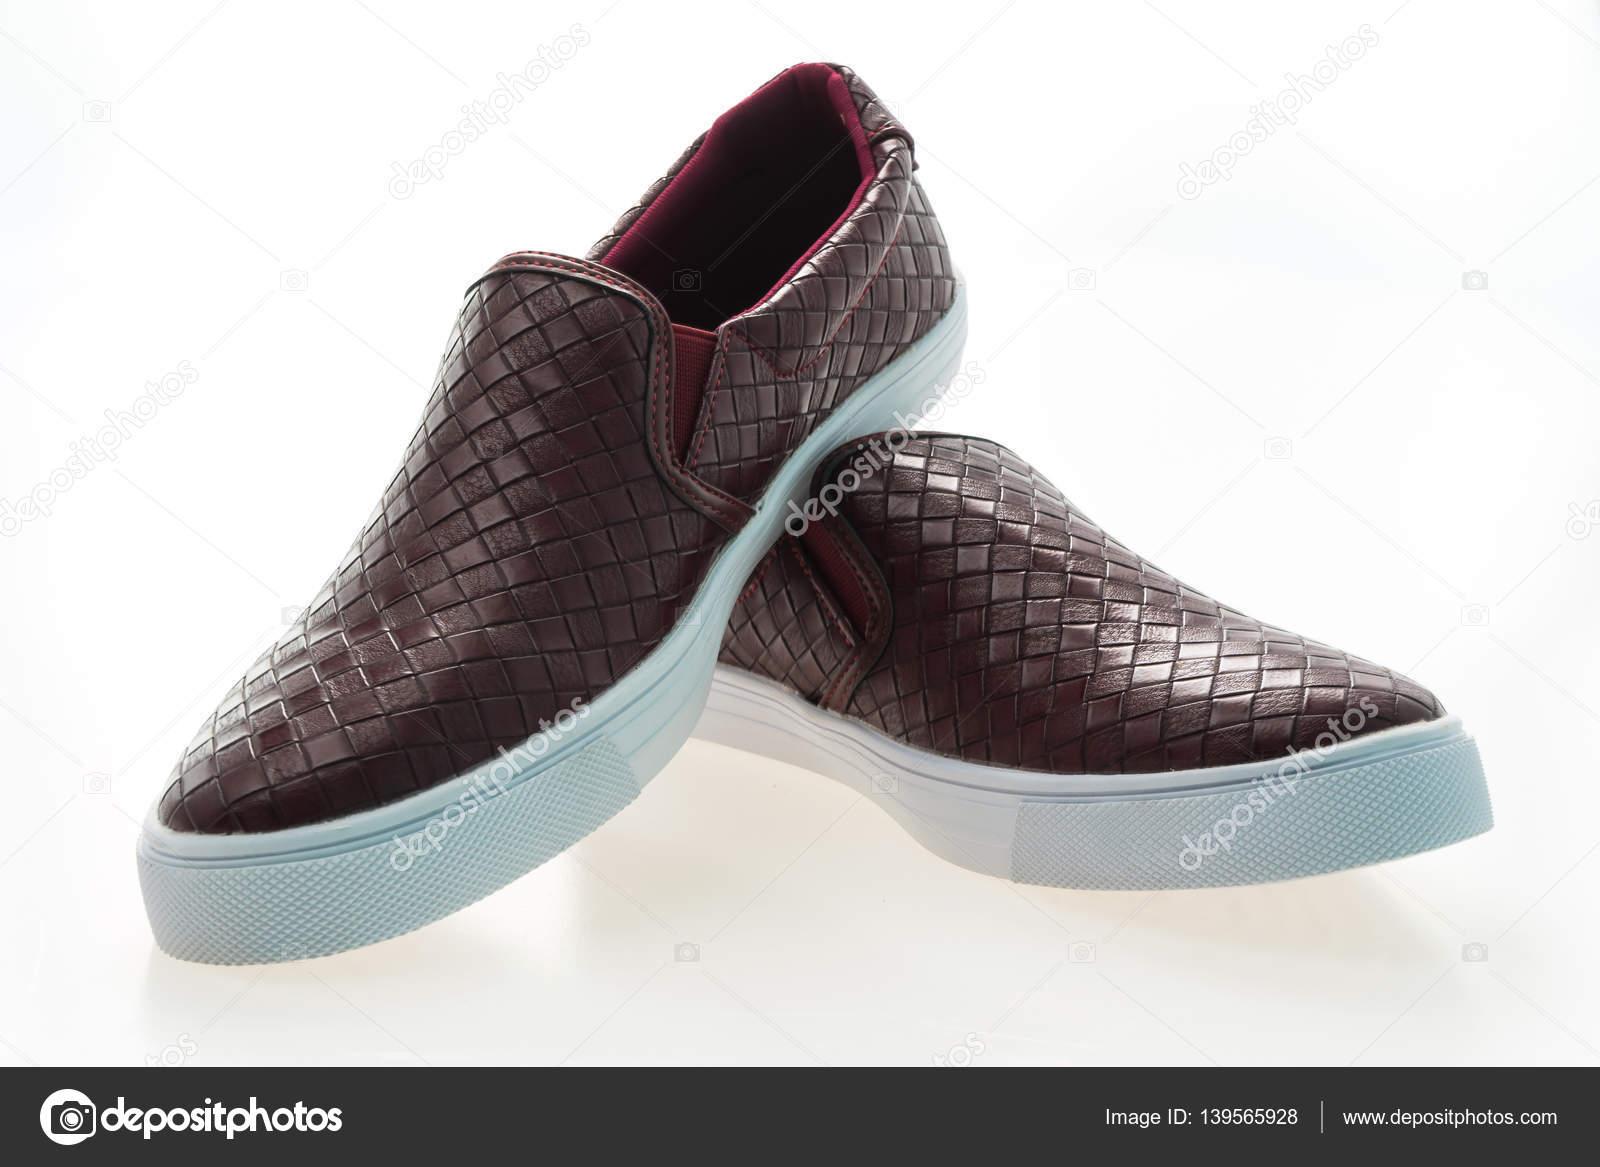 9b2686bf1d3 Παπούτσια πάνινα παπούτσια μόδας — Φωτογραφία Αρχείου © mrsiraphol ...